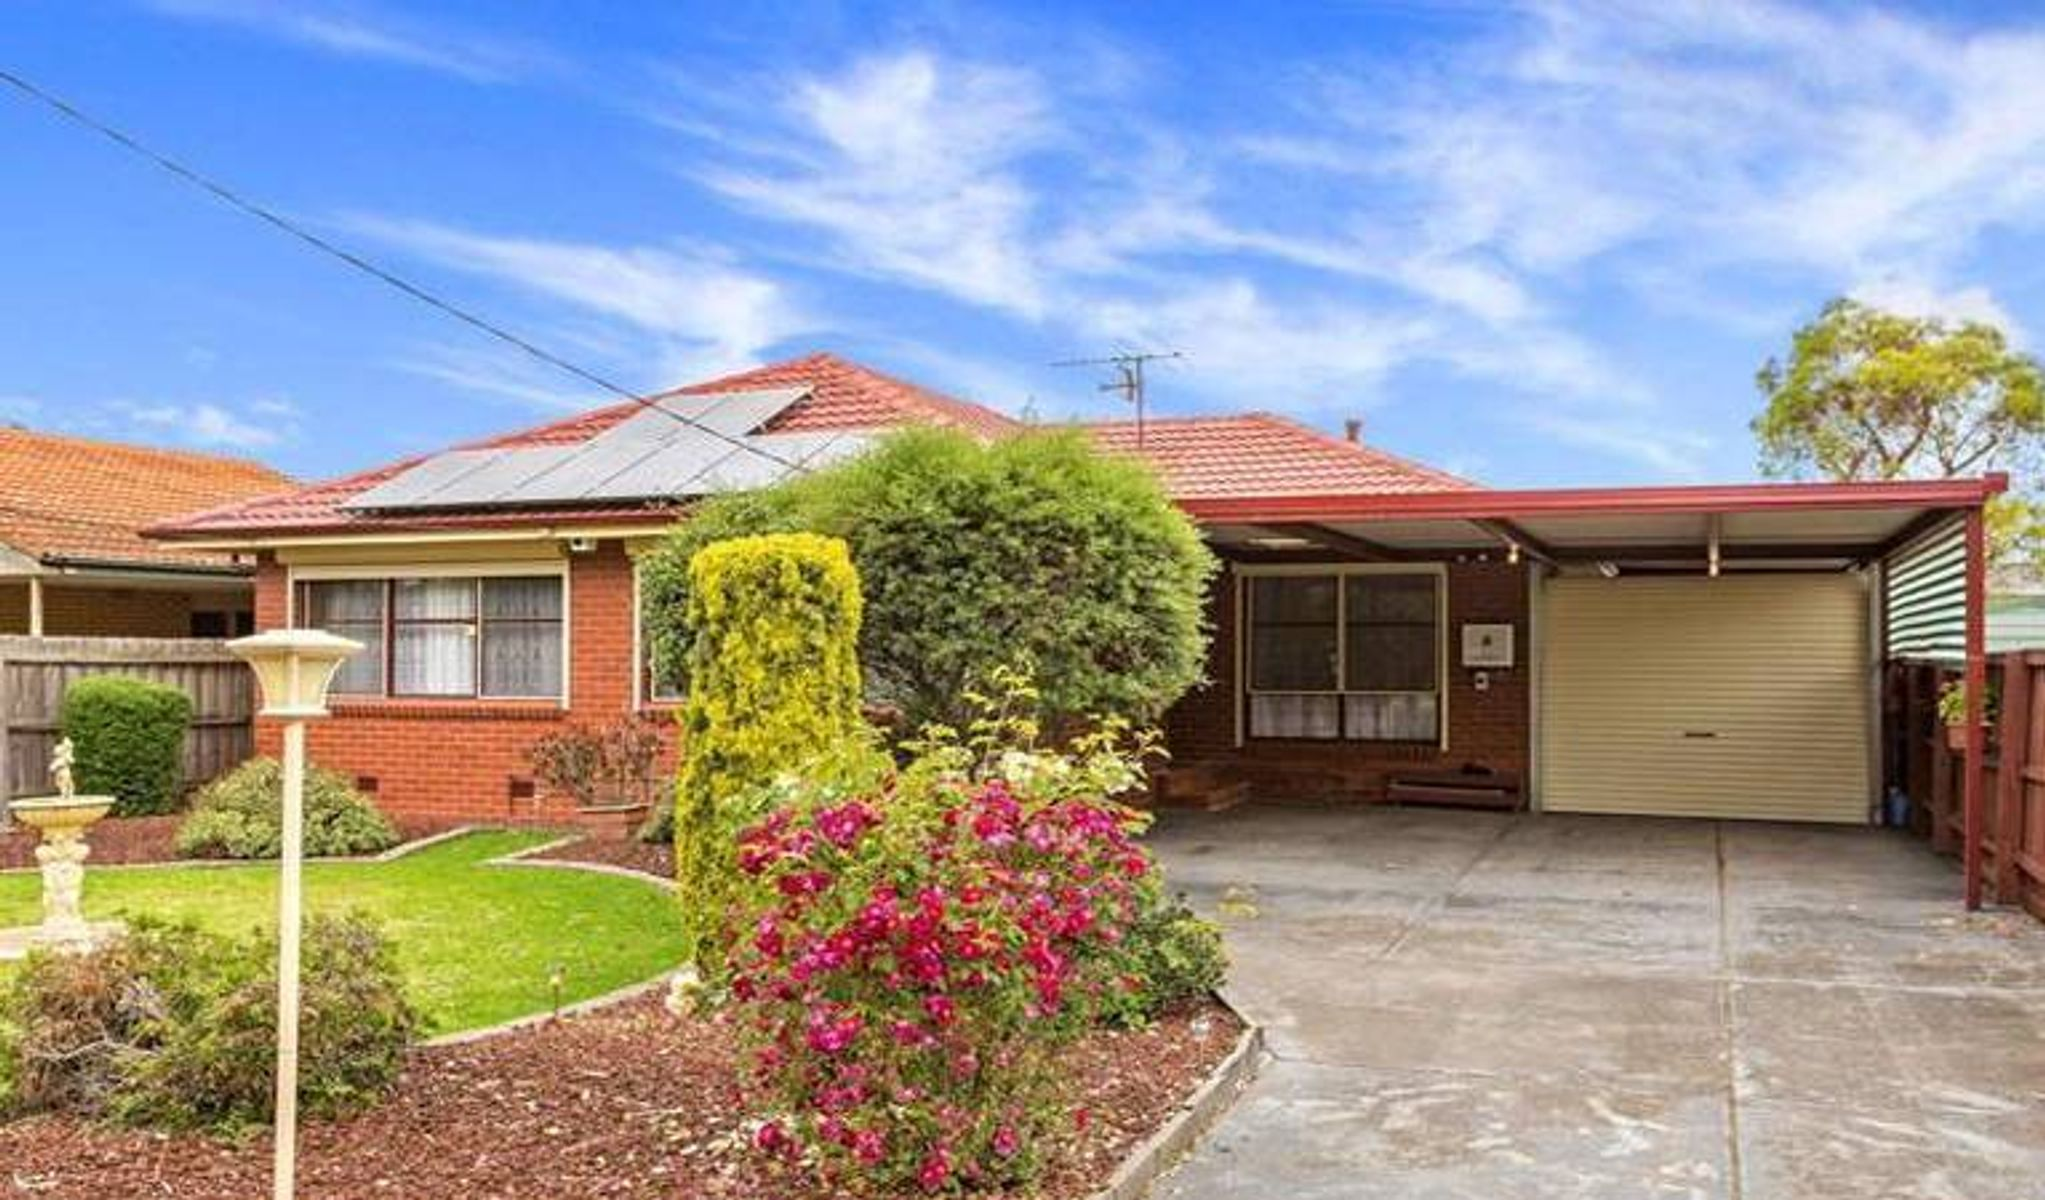 31 Old Geelong Road, Laverton, VIC 3028